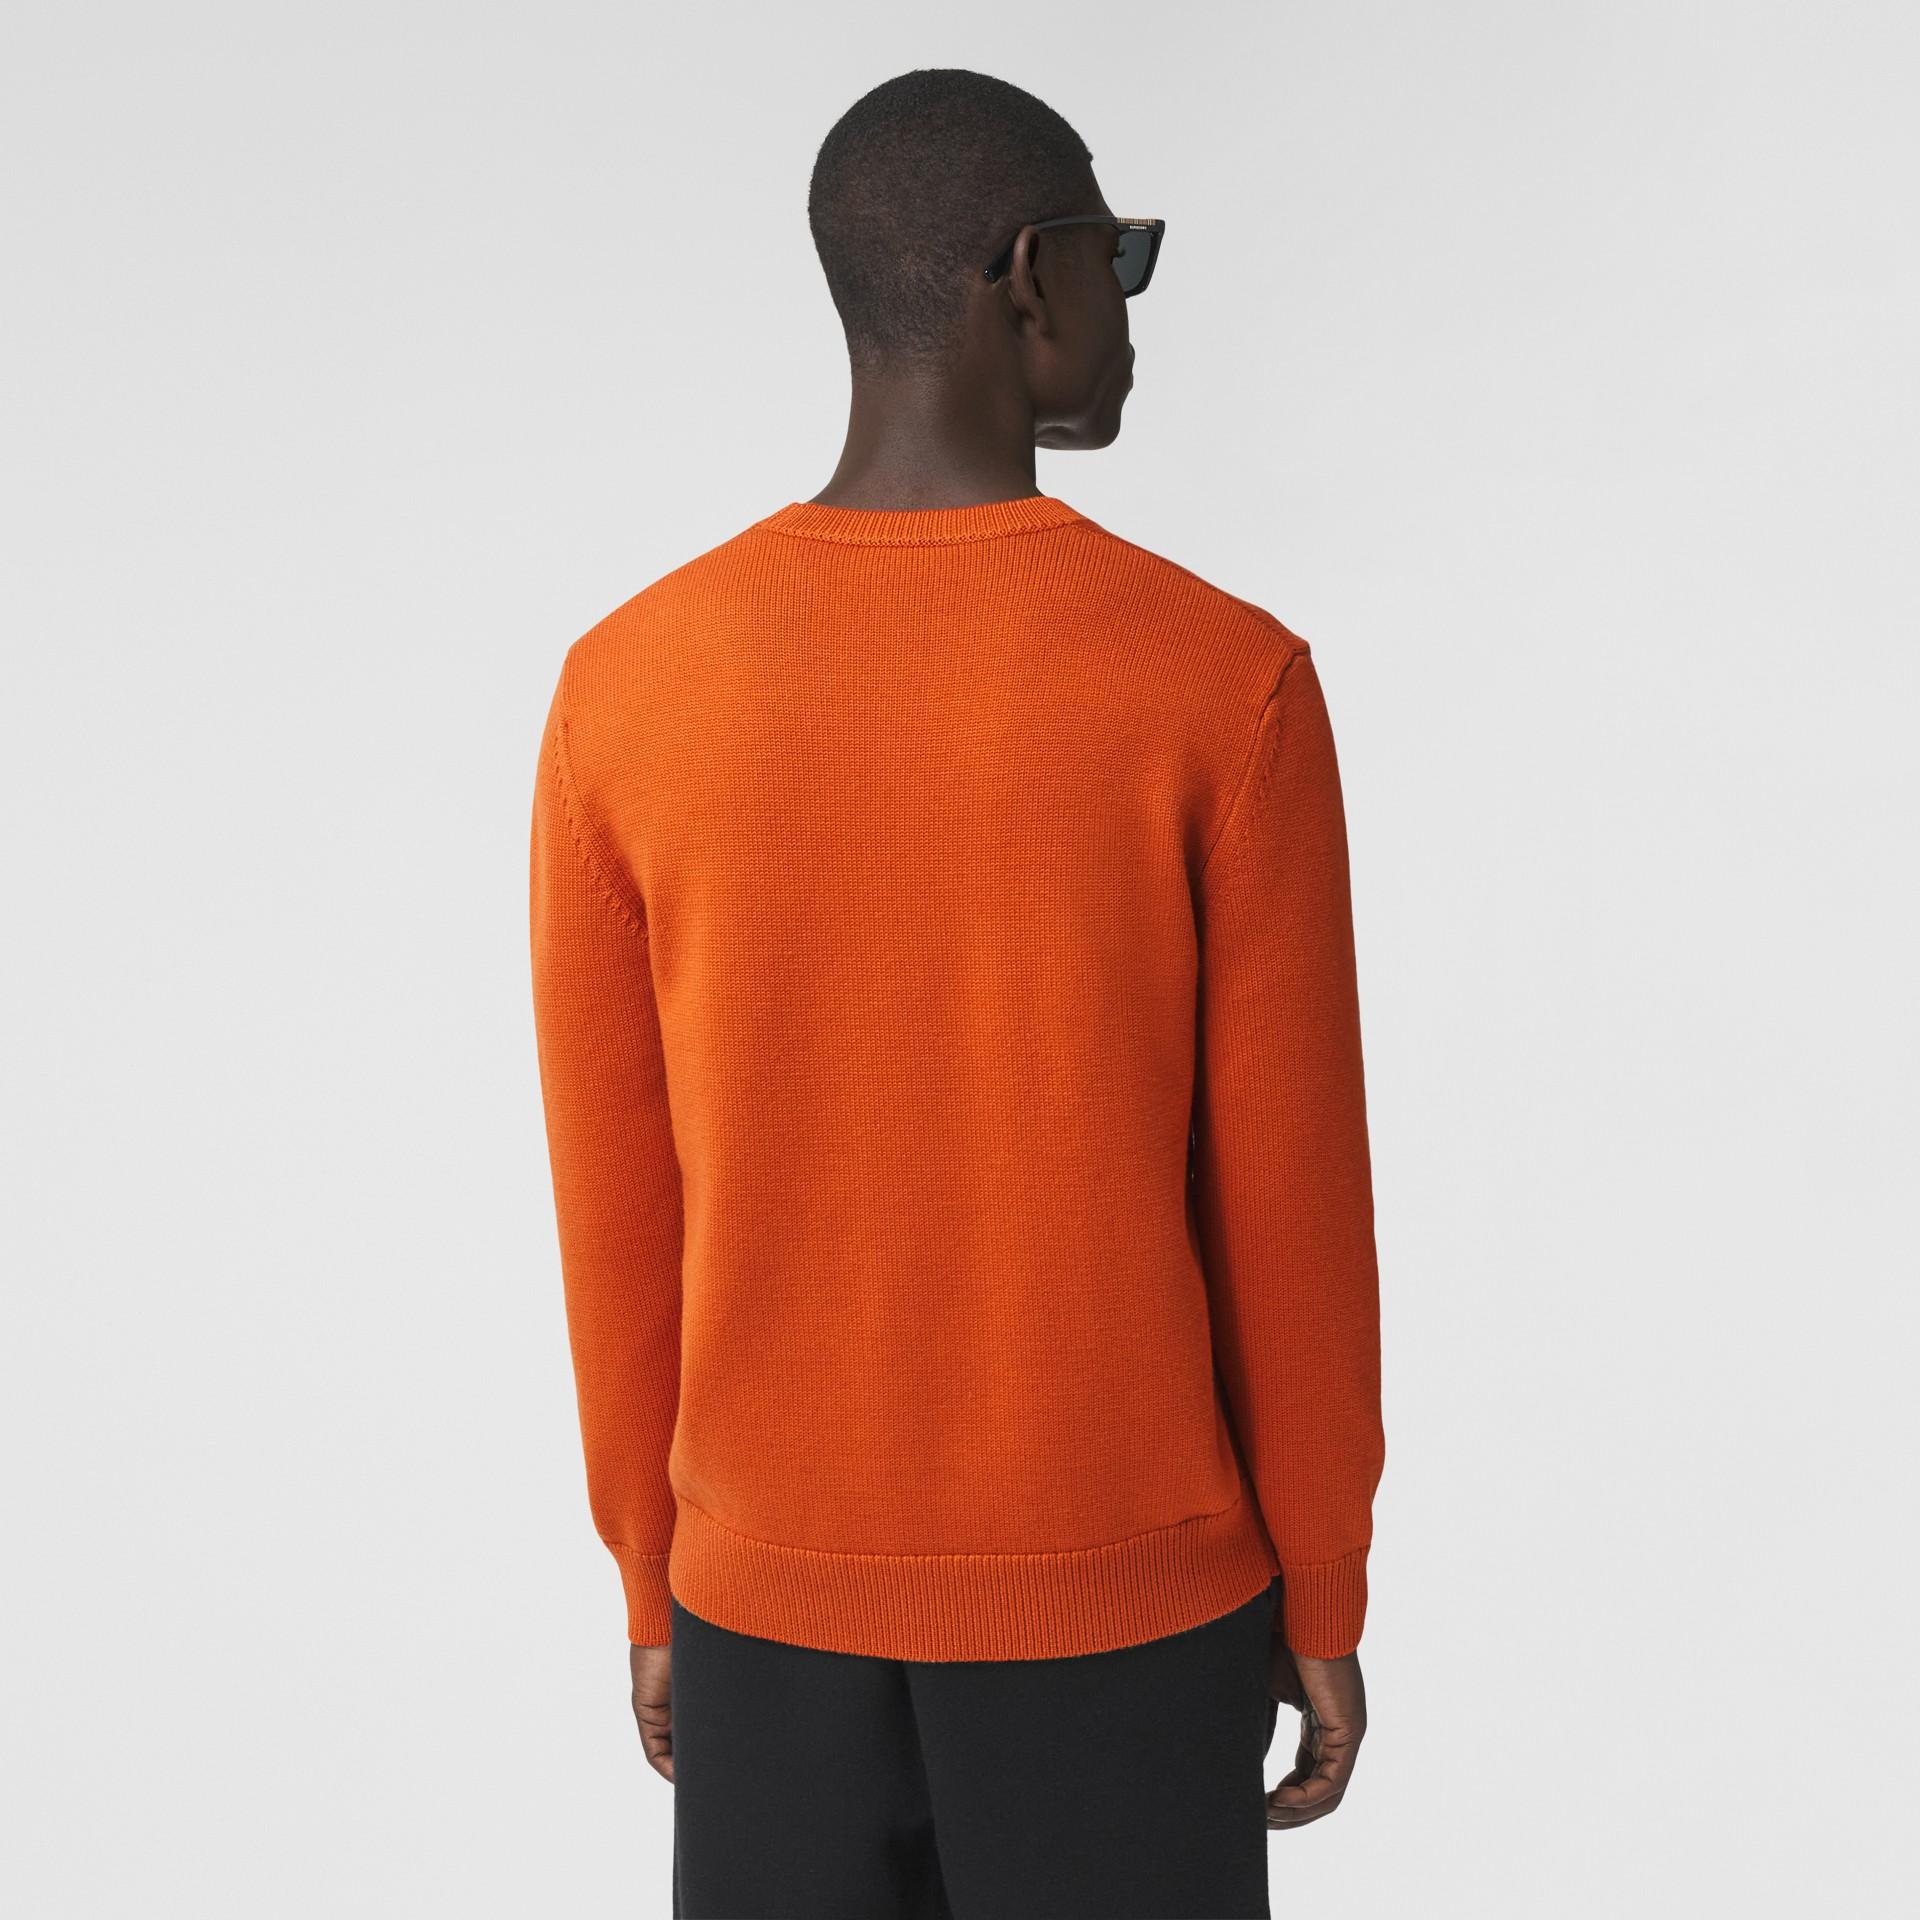 Varsity Graphic Merino Wool Jacquard Sweater in Burnt Orange - Men | Burberry - gallery image 2